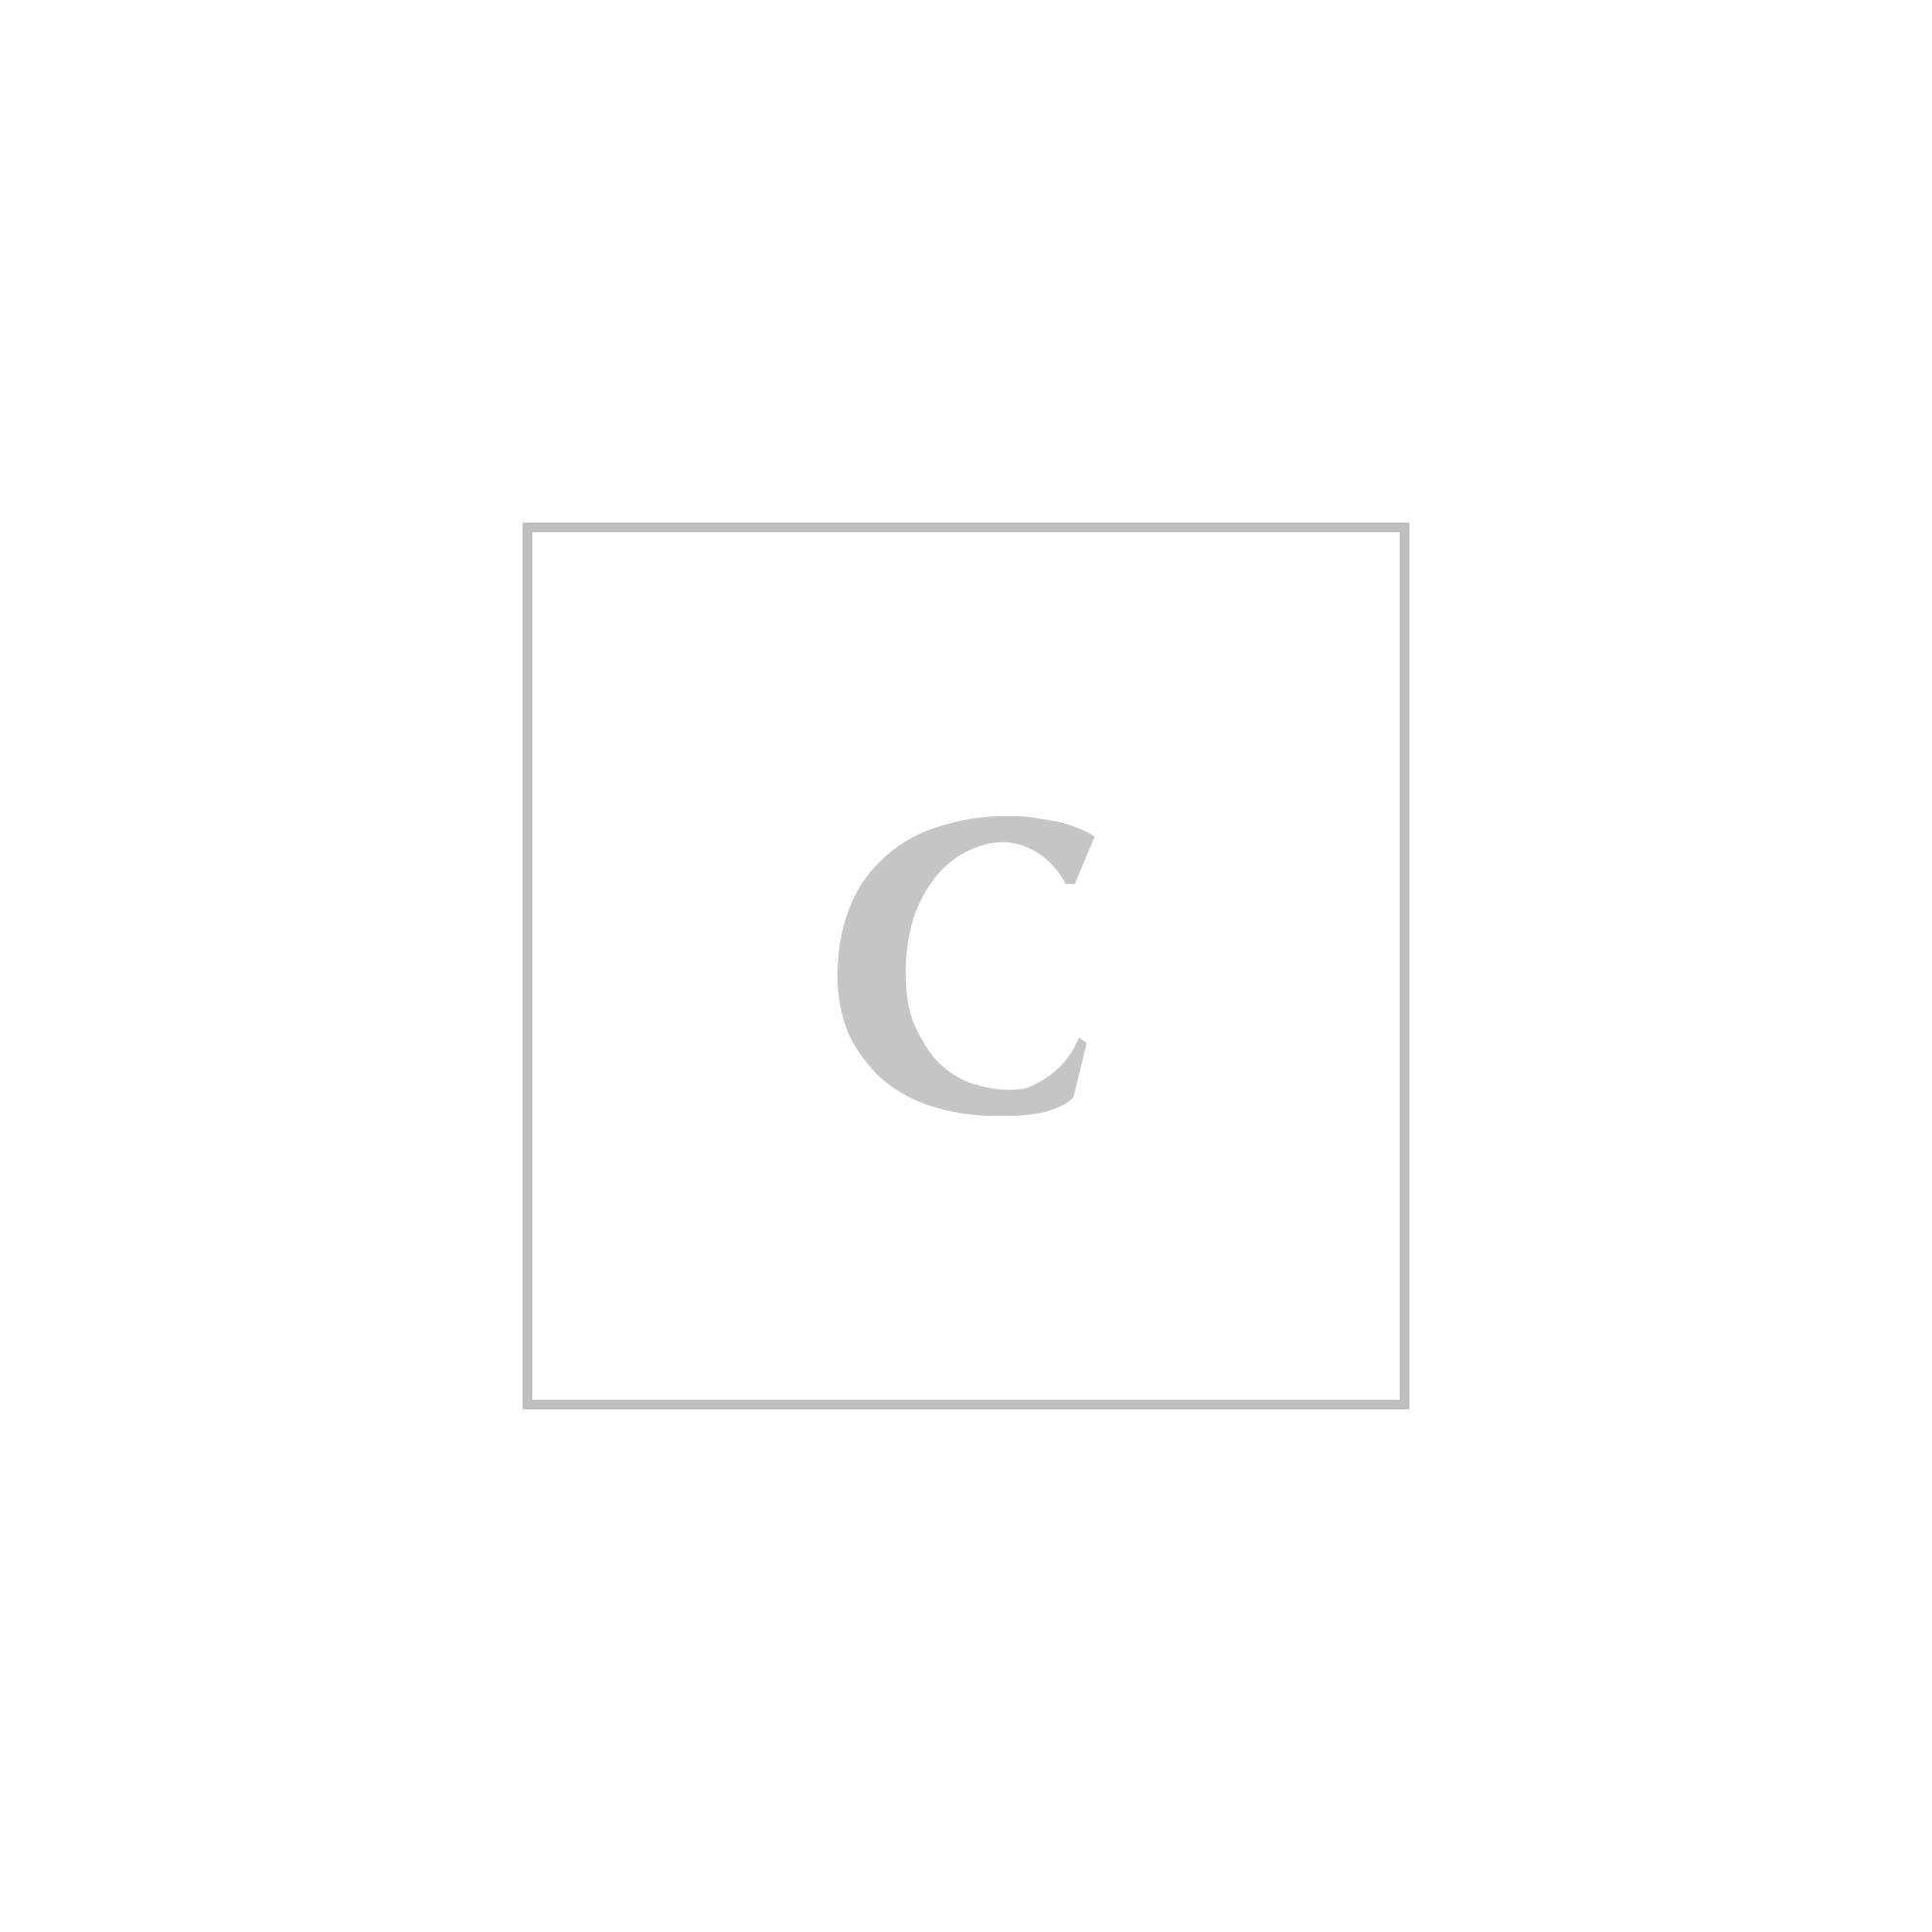 Burberry portachiavi thomas